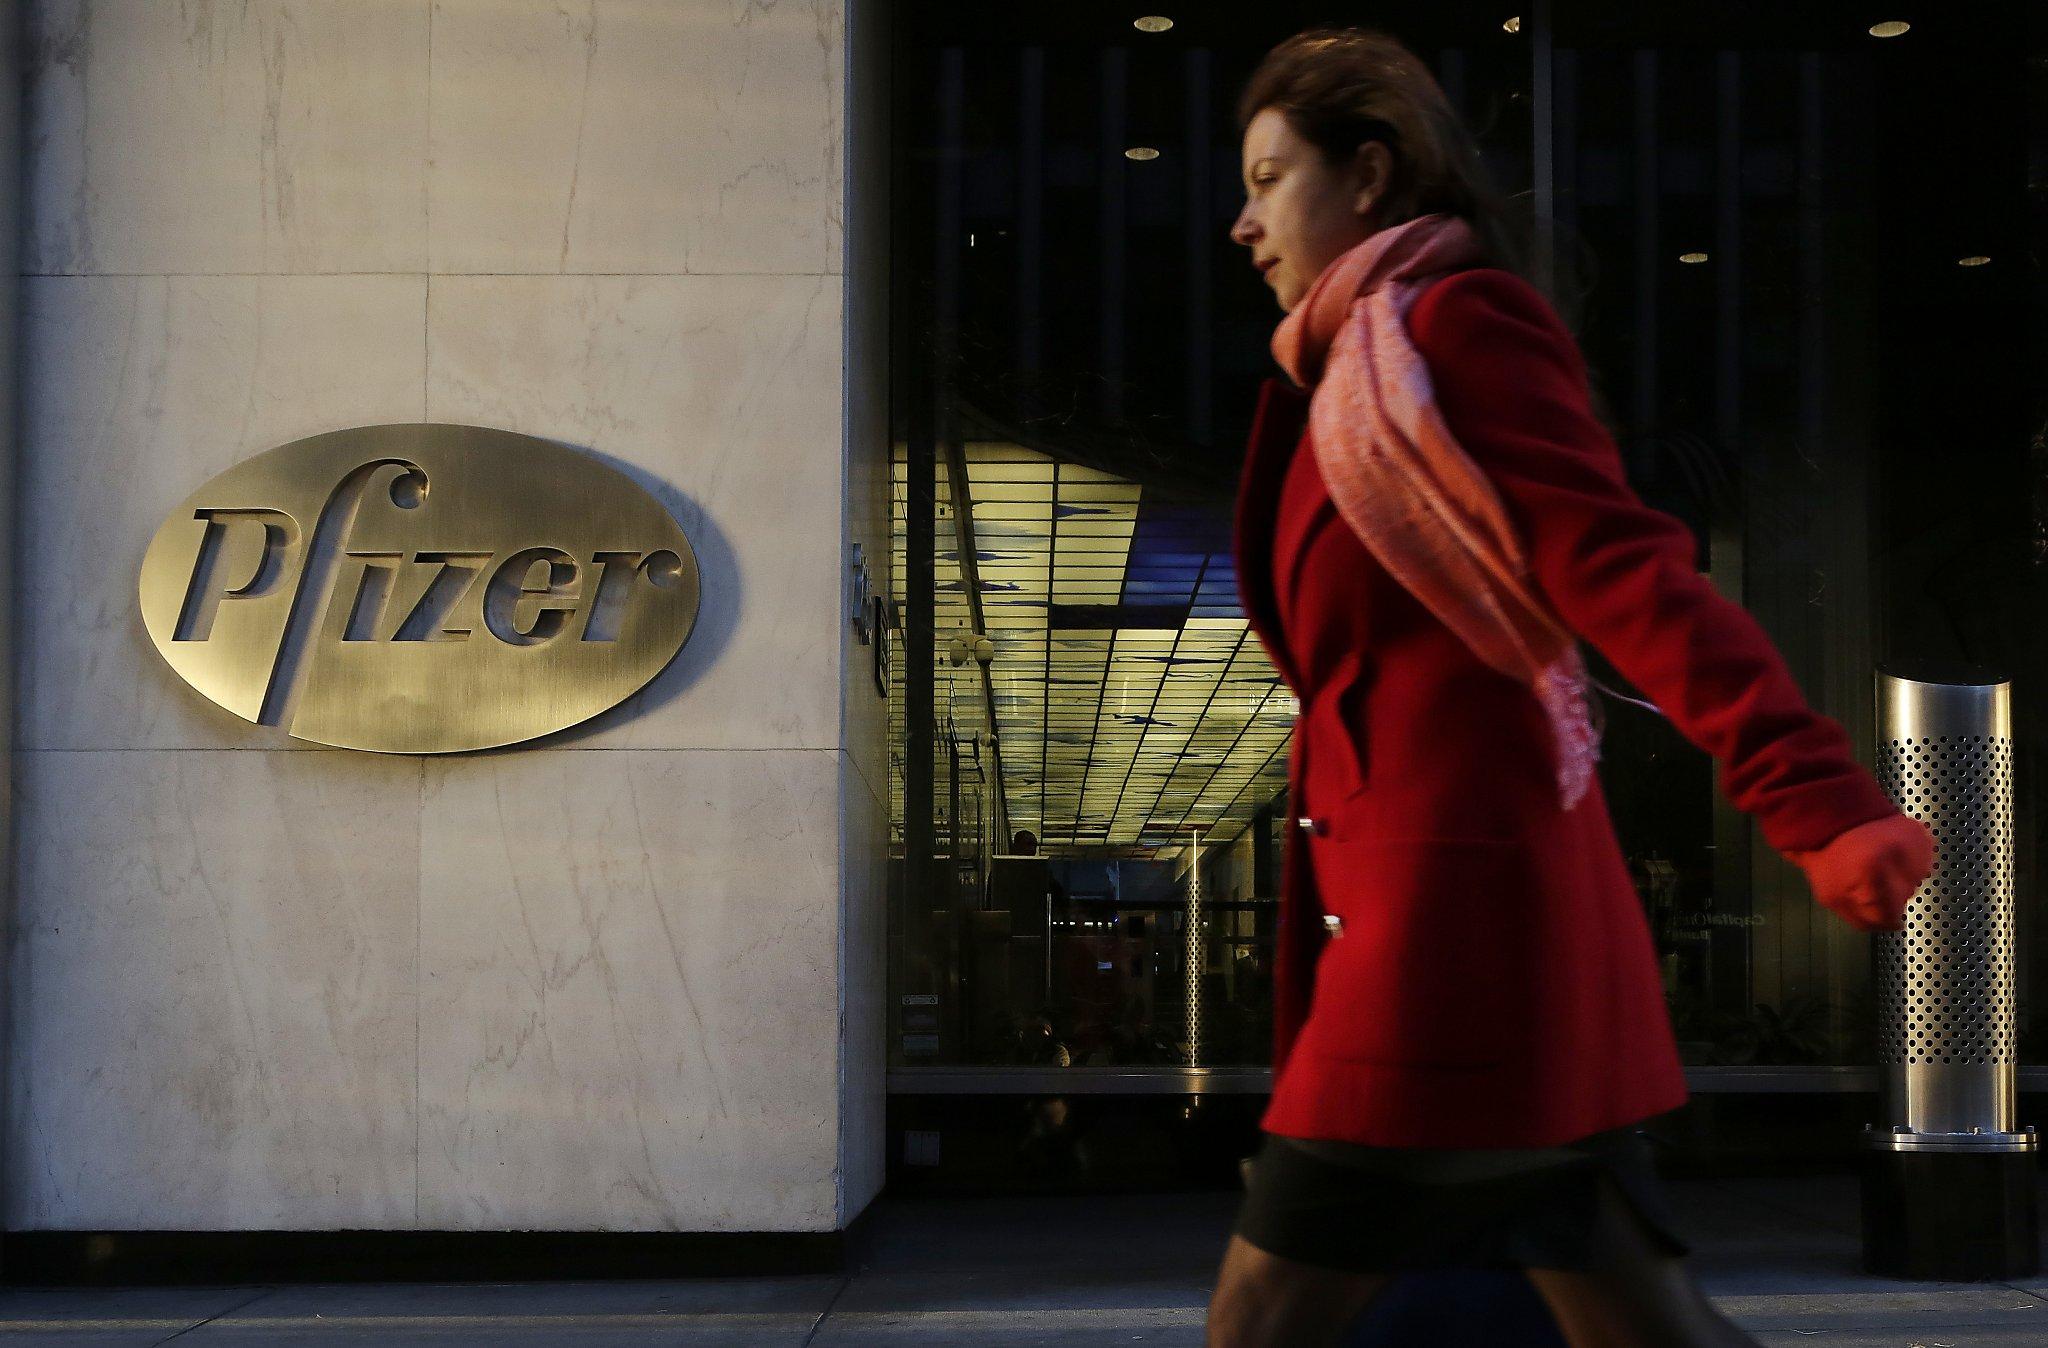 Pfizer profit plunges, cholesterol drug dropped - SFGate